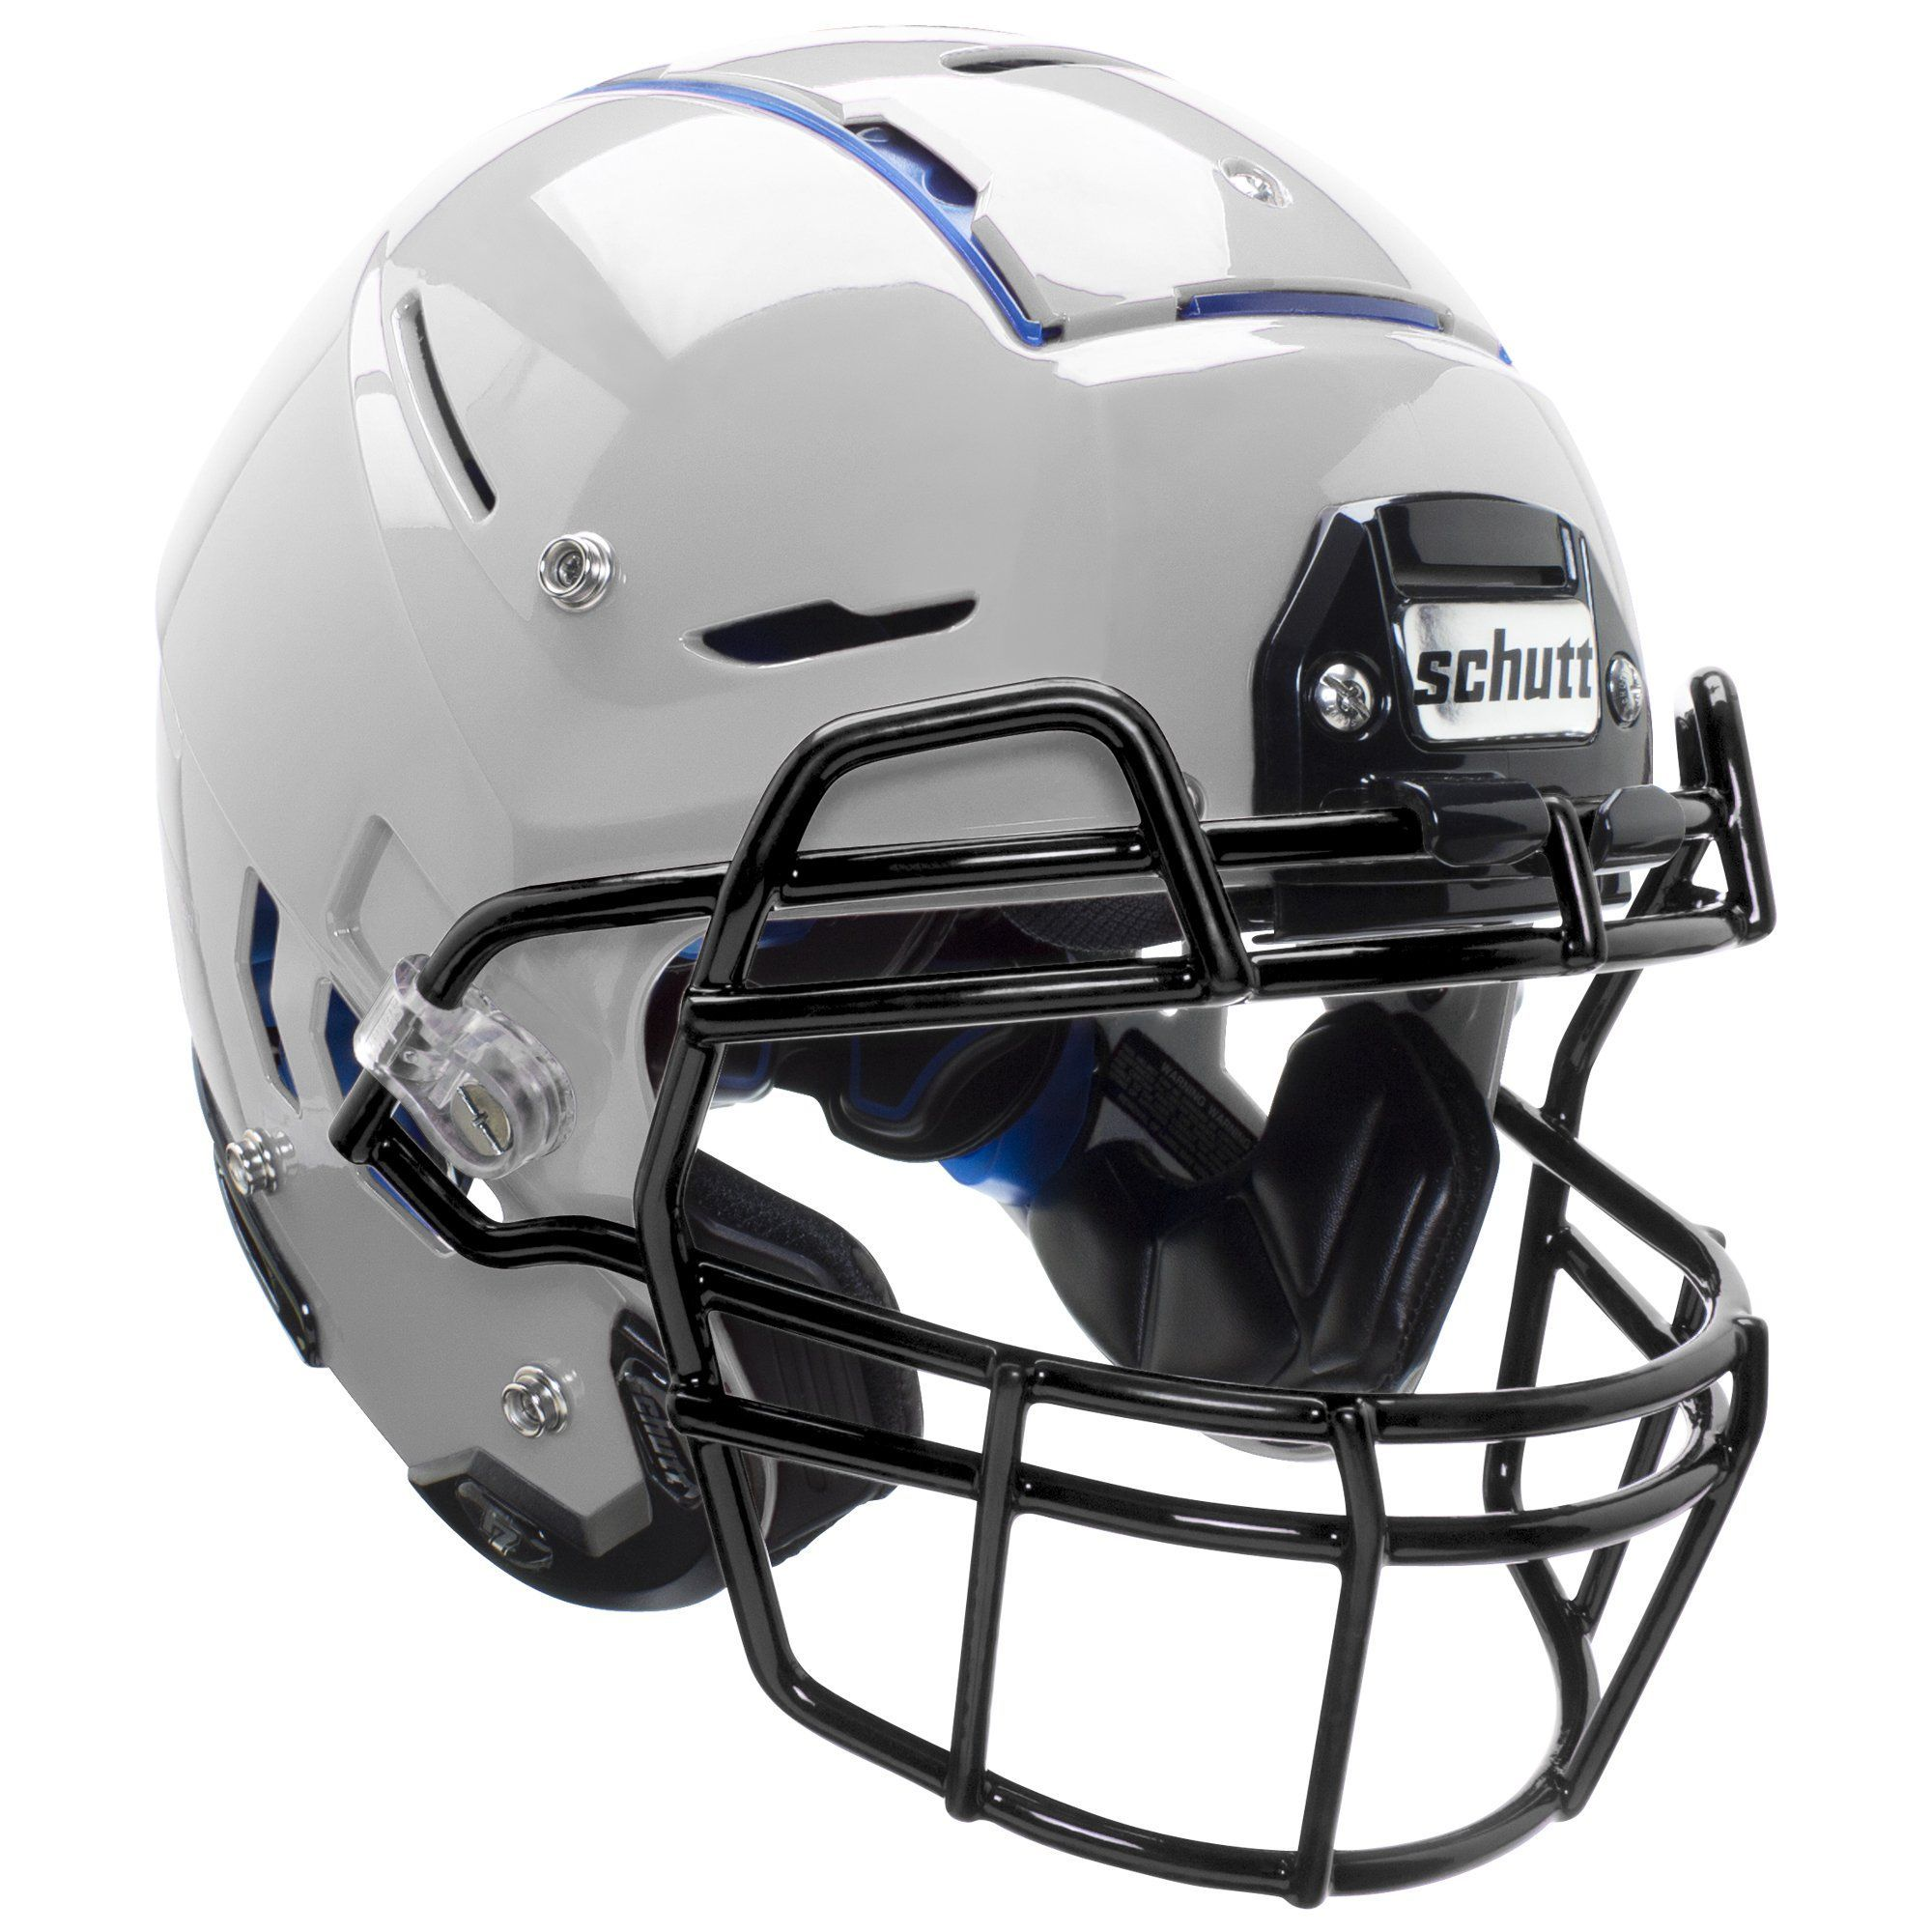 ORANGE Schutt AiR XP Pro VTD II Football Helmet ADULT LARGE w// Facemask